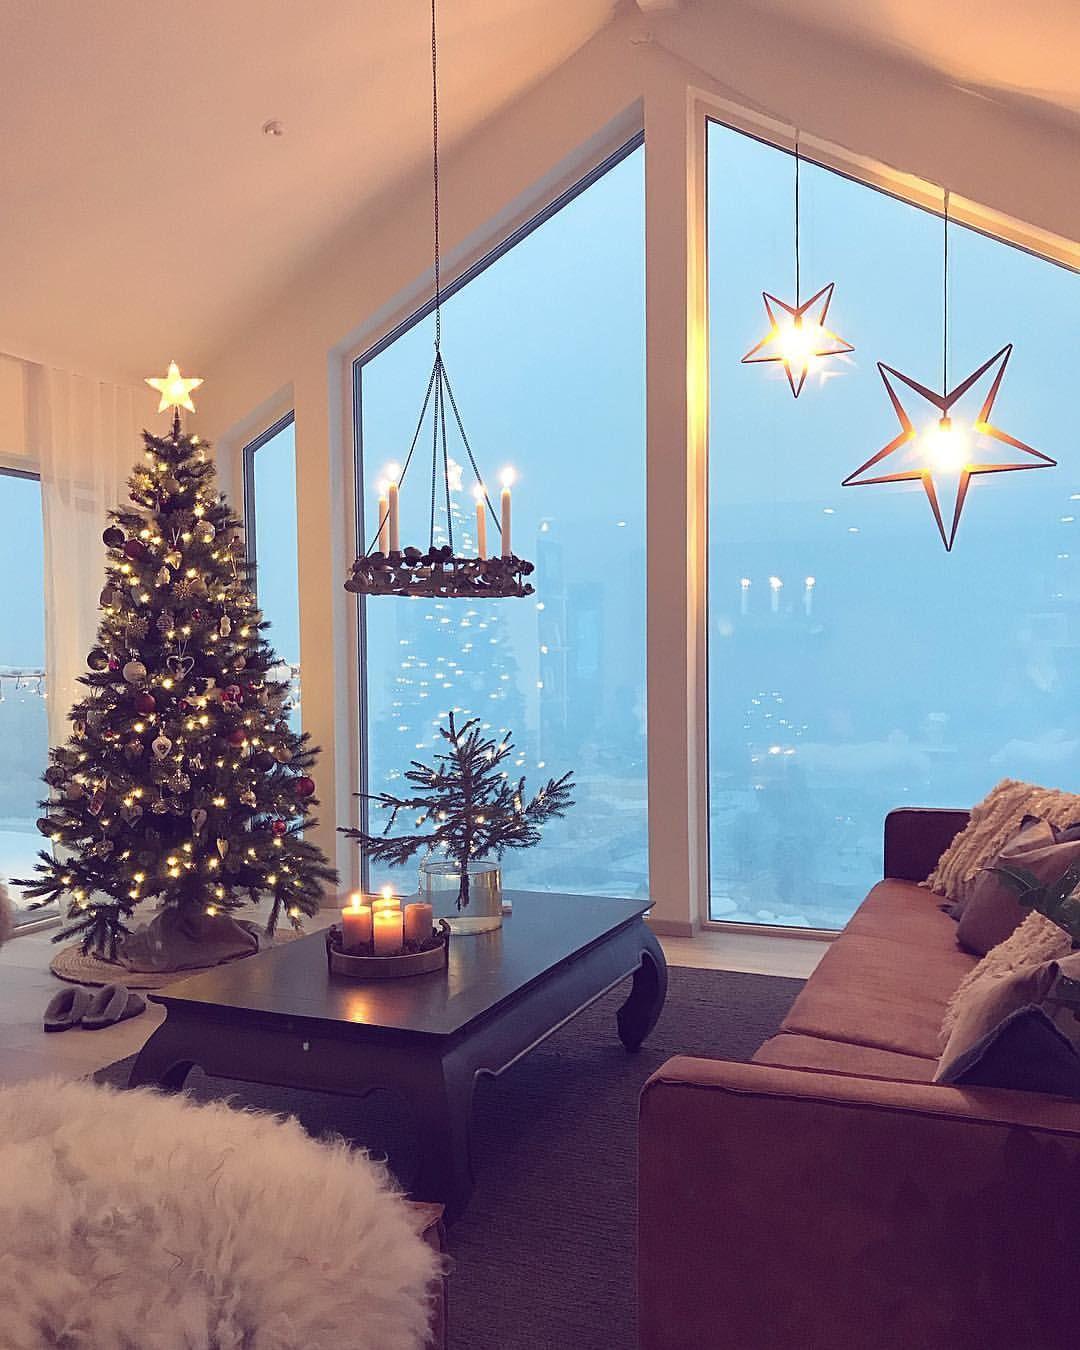 4 482 Likes 77 Comments Malene Foss Husefjell On Instagram God Morgen Mimrer Tilb Christmas Decorations For The Home Christmas Home Winter Home Decor